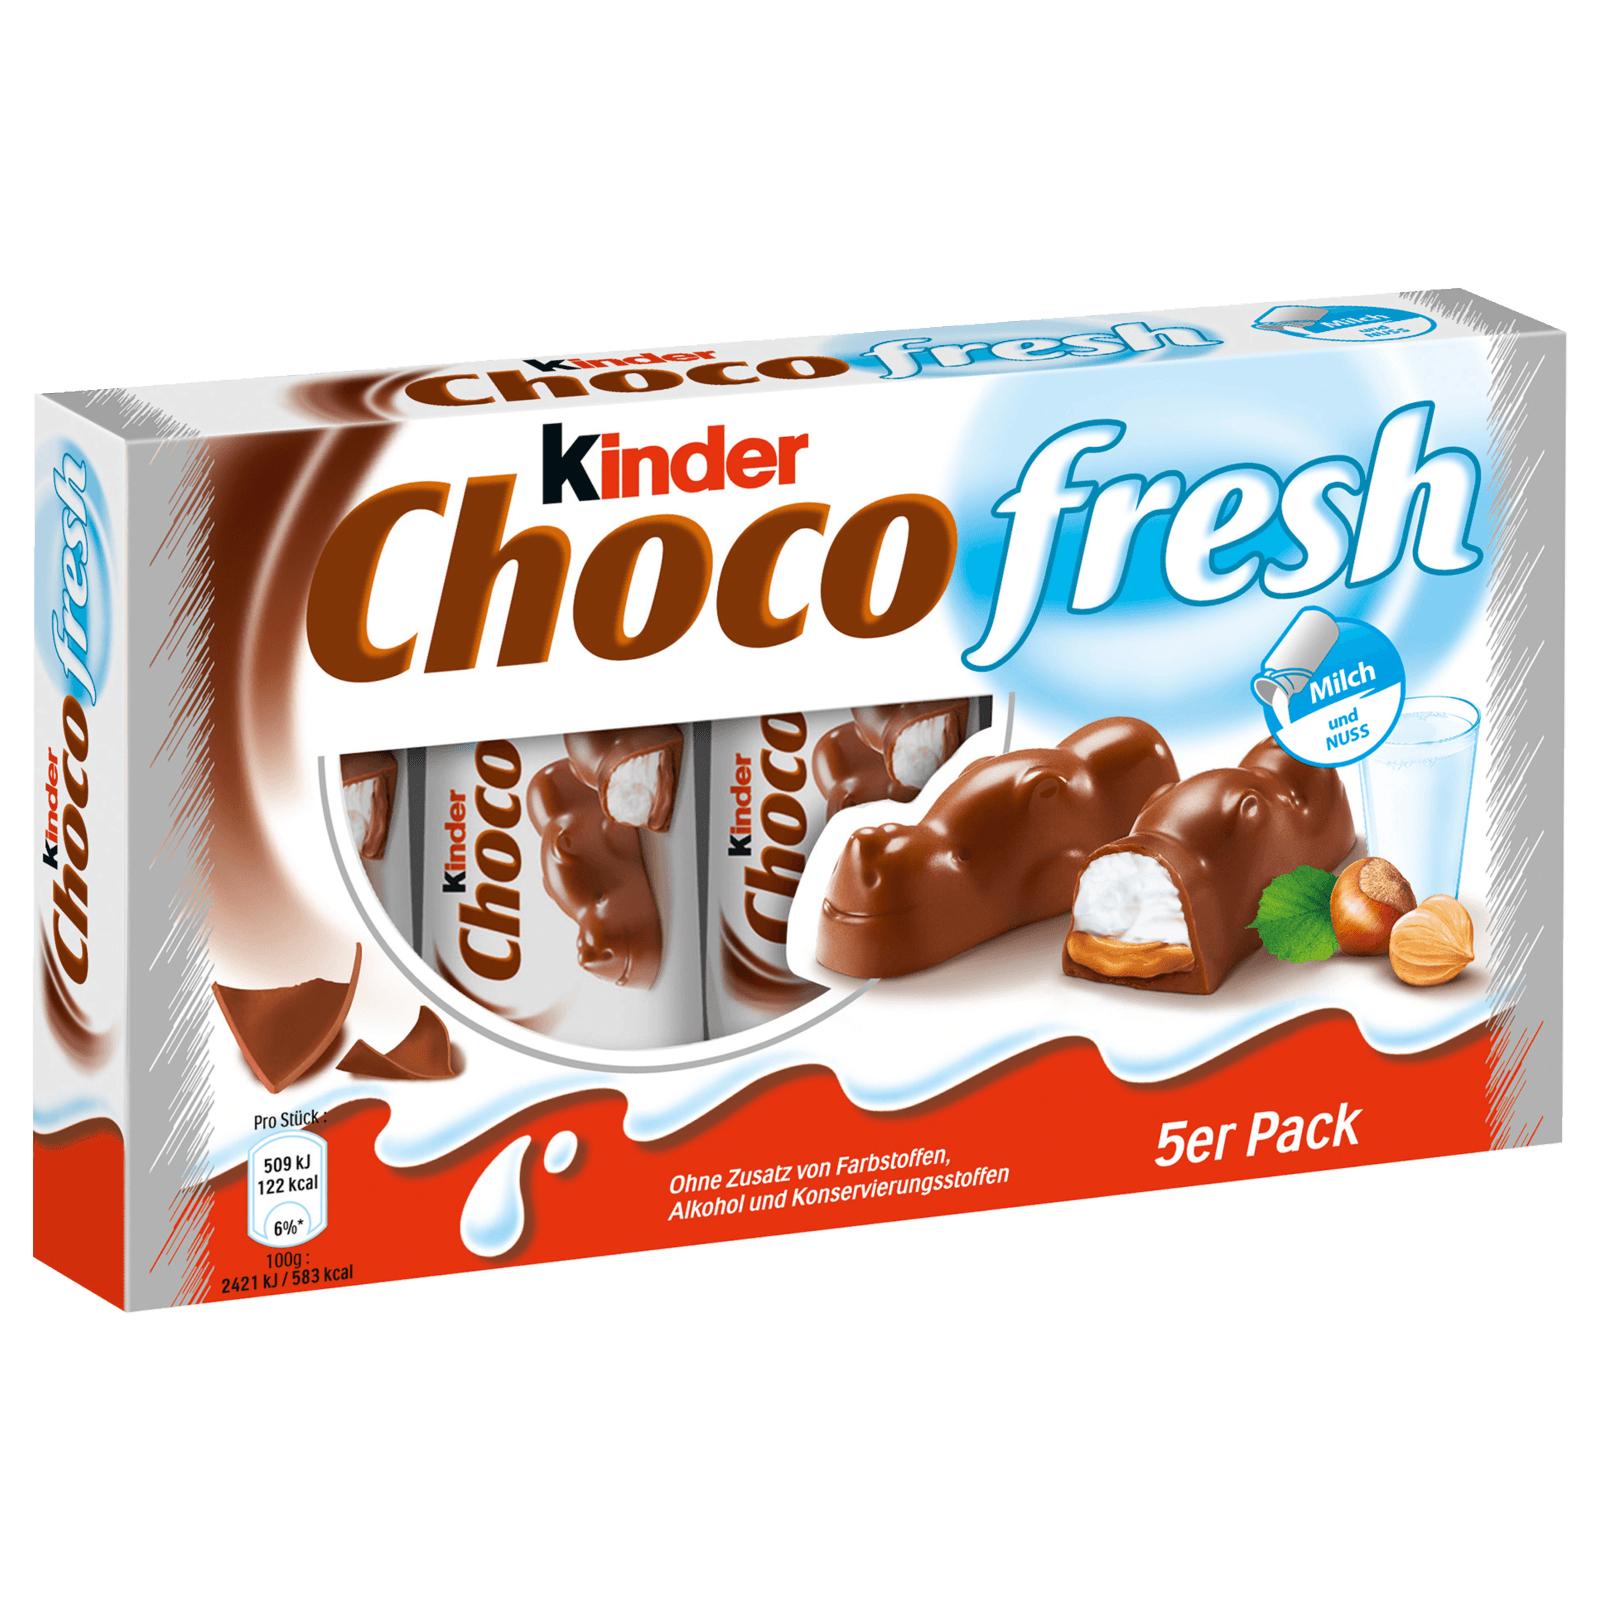 Kinder Choco fresh bei Lidl